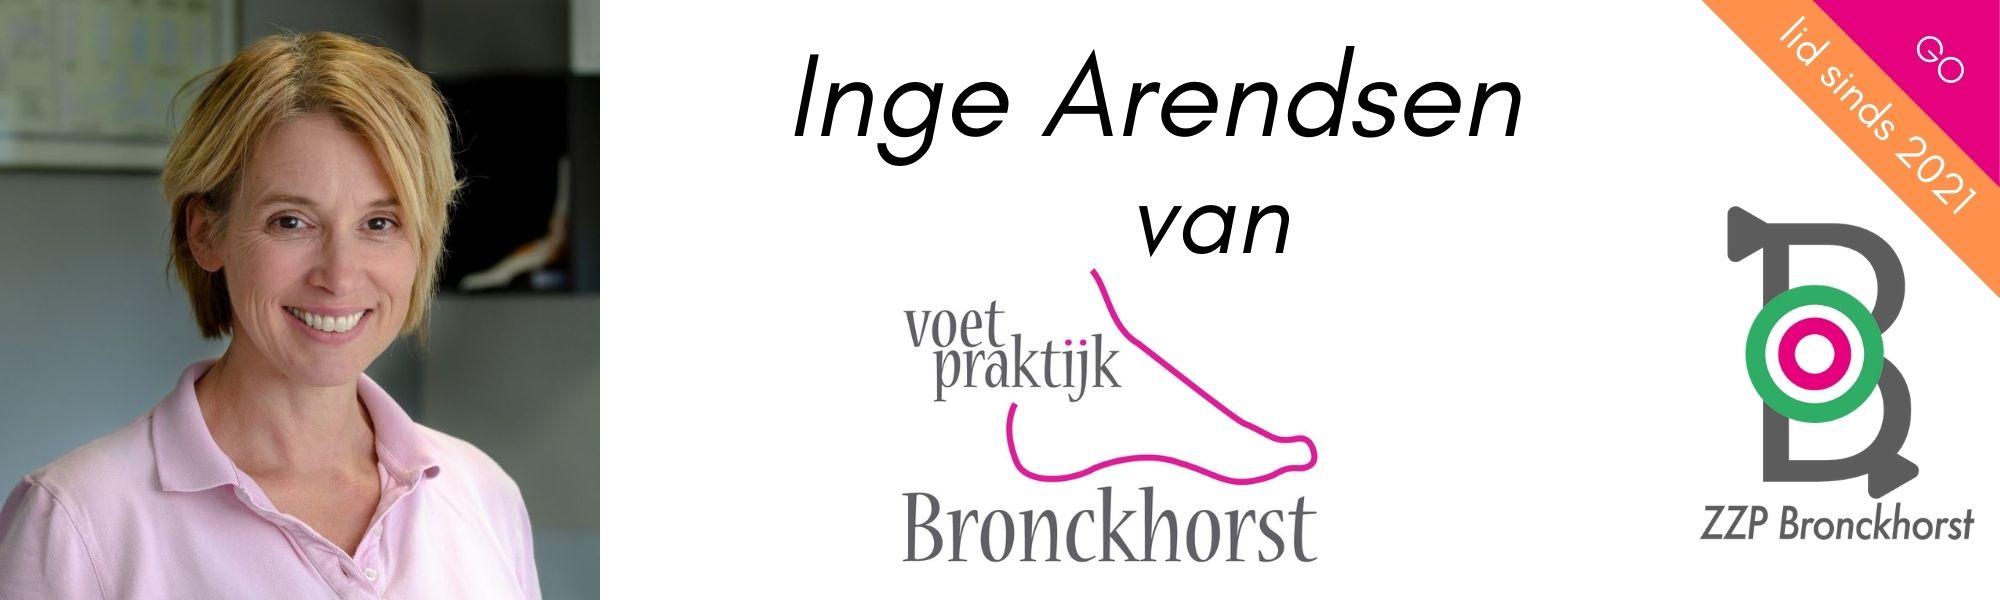 voetpraktijk-bronckhorst-medisch-pedicure-zzpbronckhorst